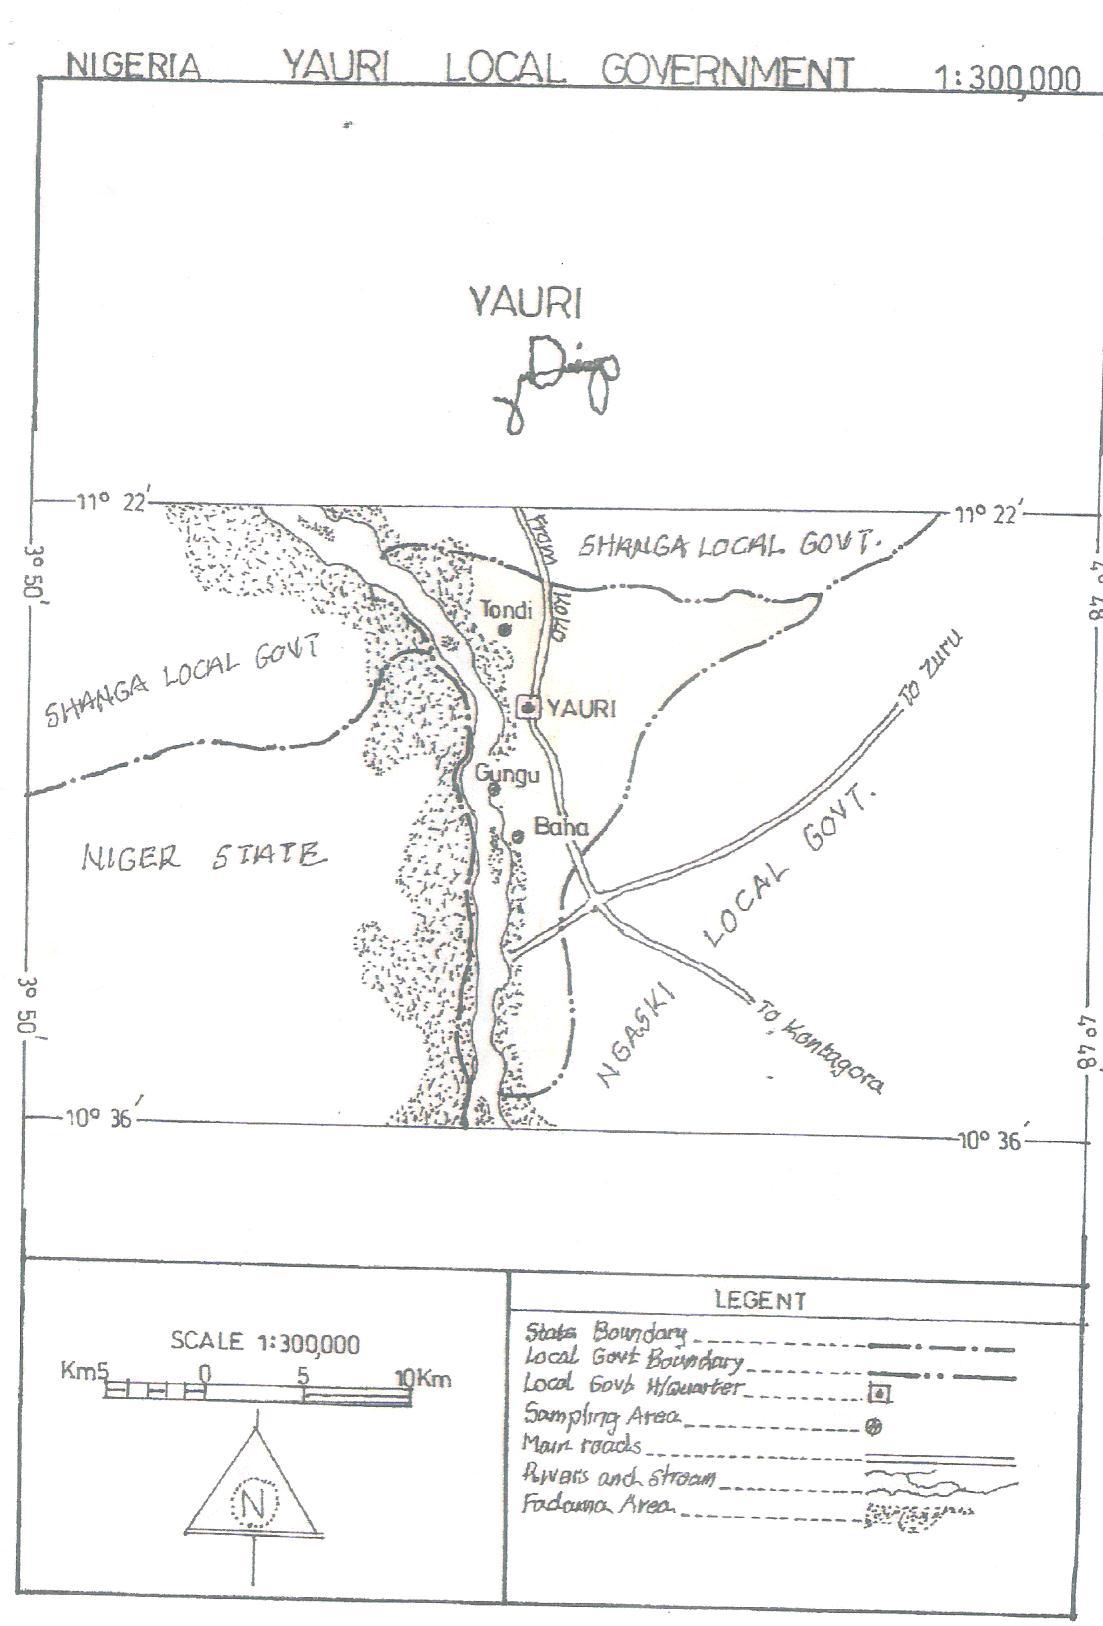 C:\Users\User\Documents\Scanned Documents\Yauri Map 1.jpg